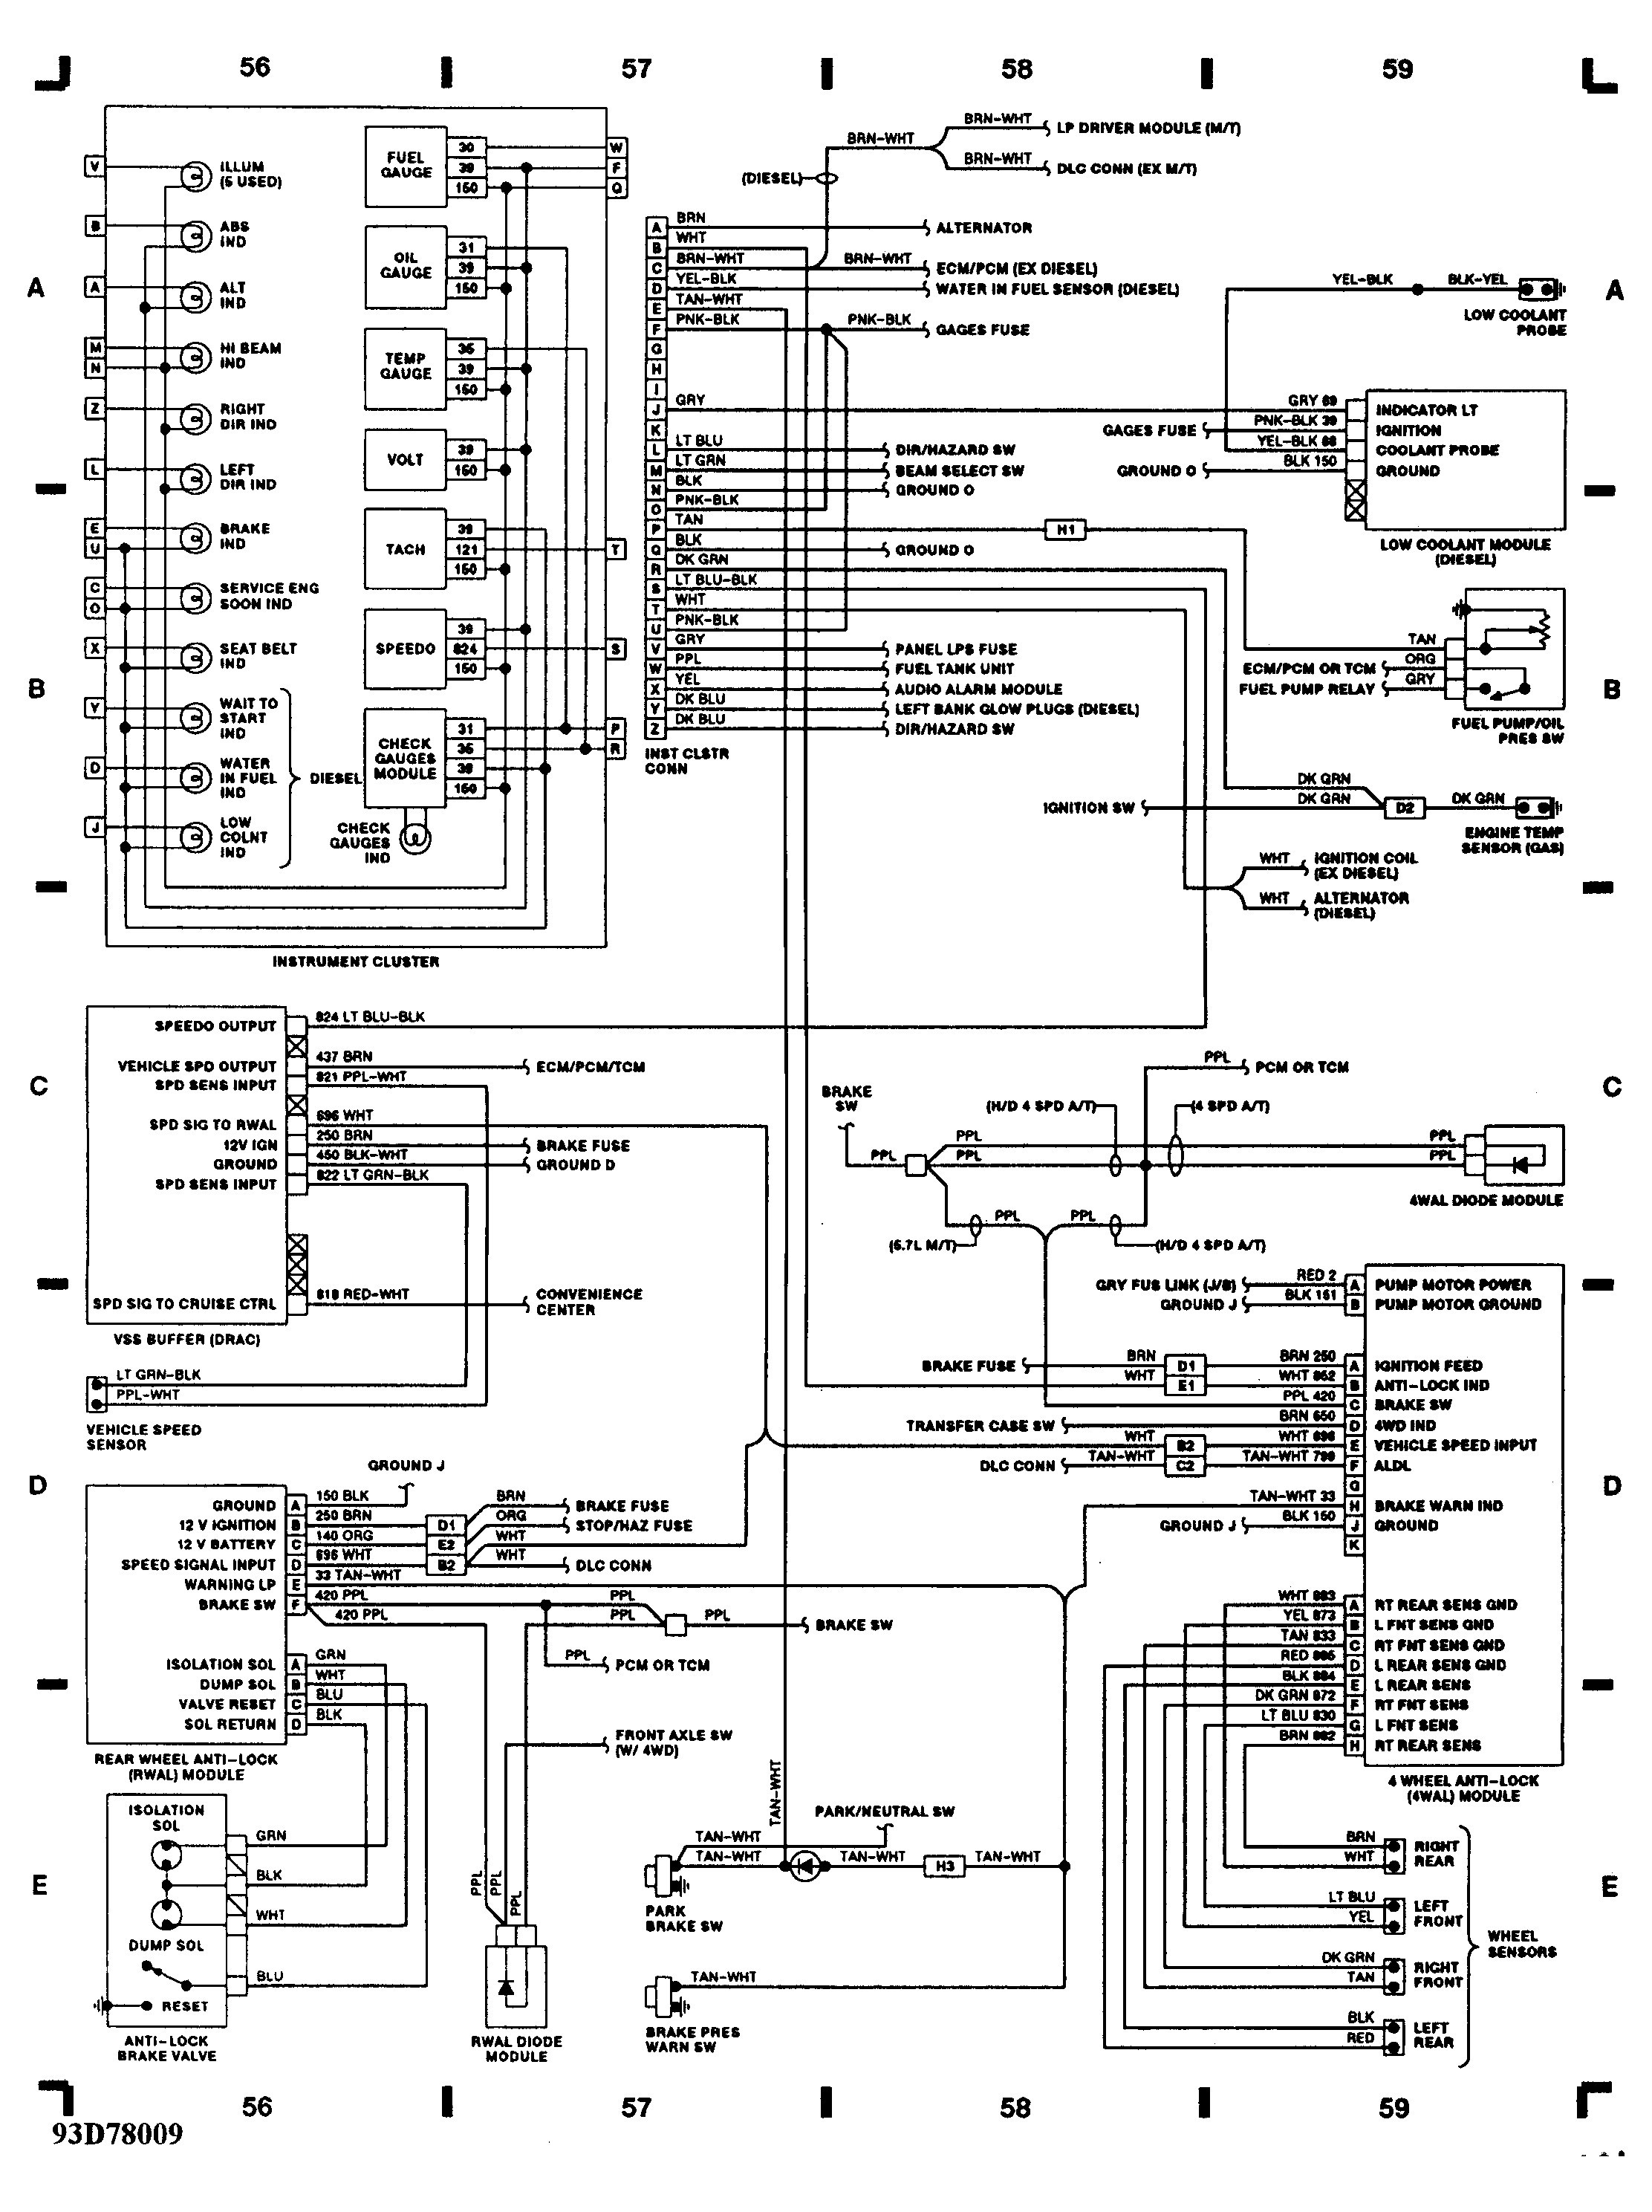 [DIAGRAM] Power Locks Wiring Diagram For 1995 Chevy FULL ...